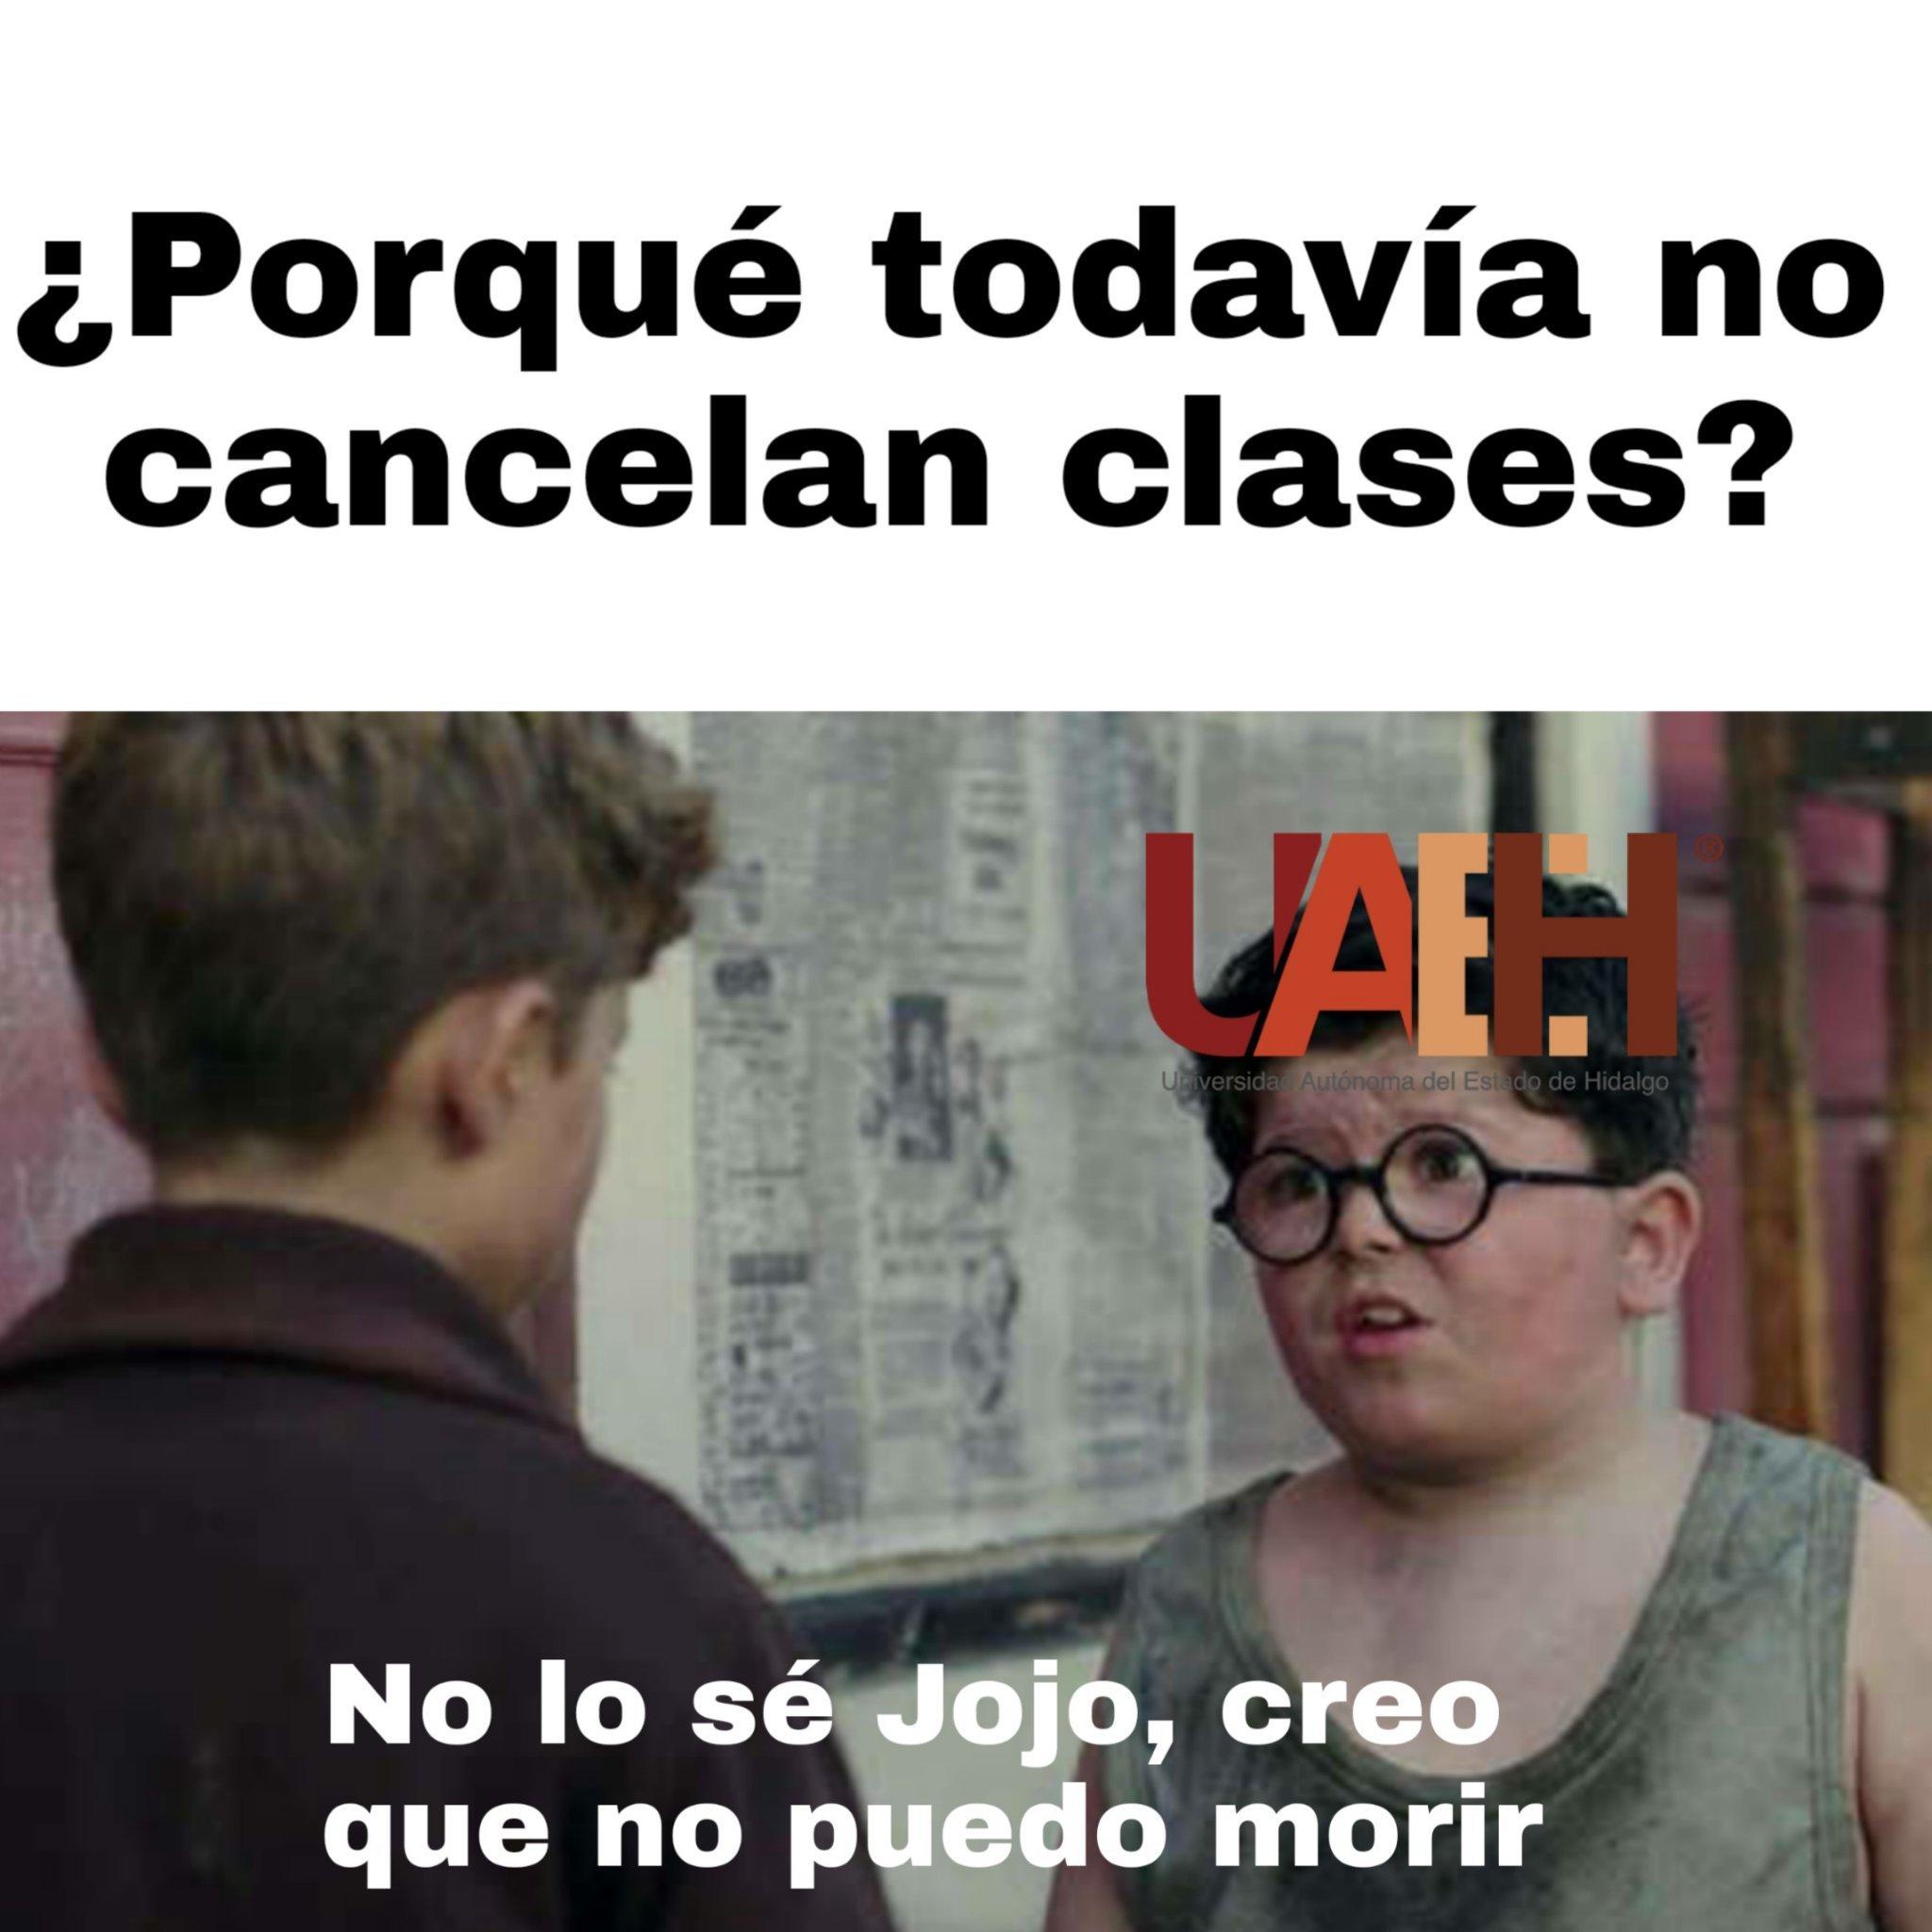 Mi universidad no canceló clases :c - meme